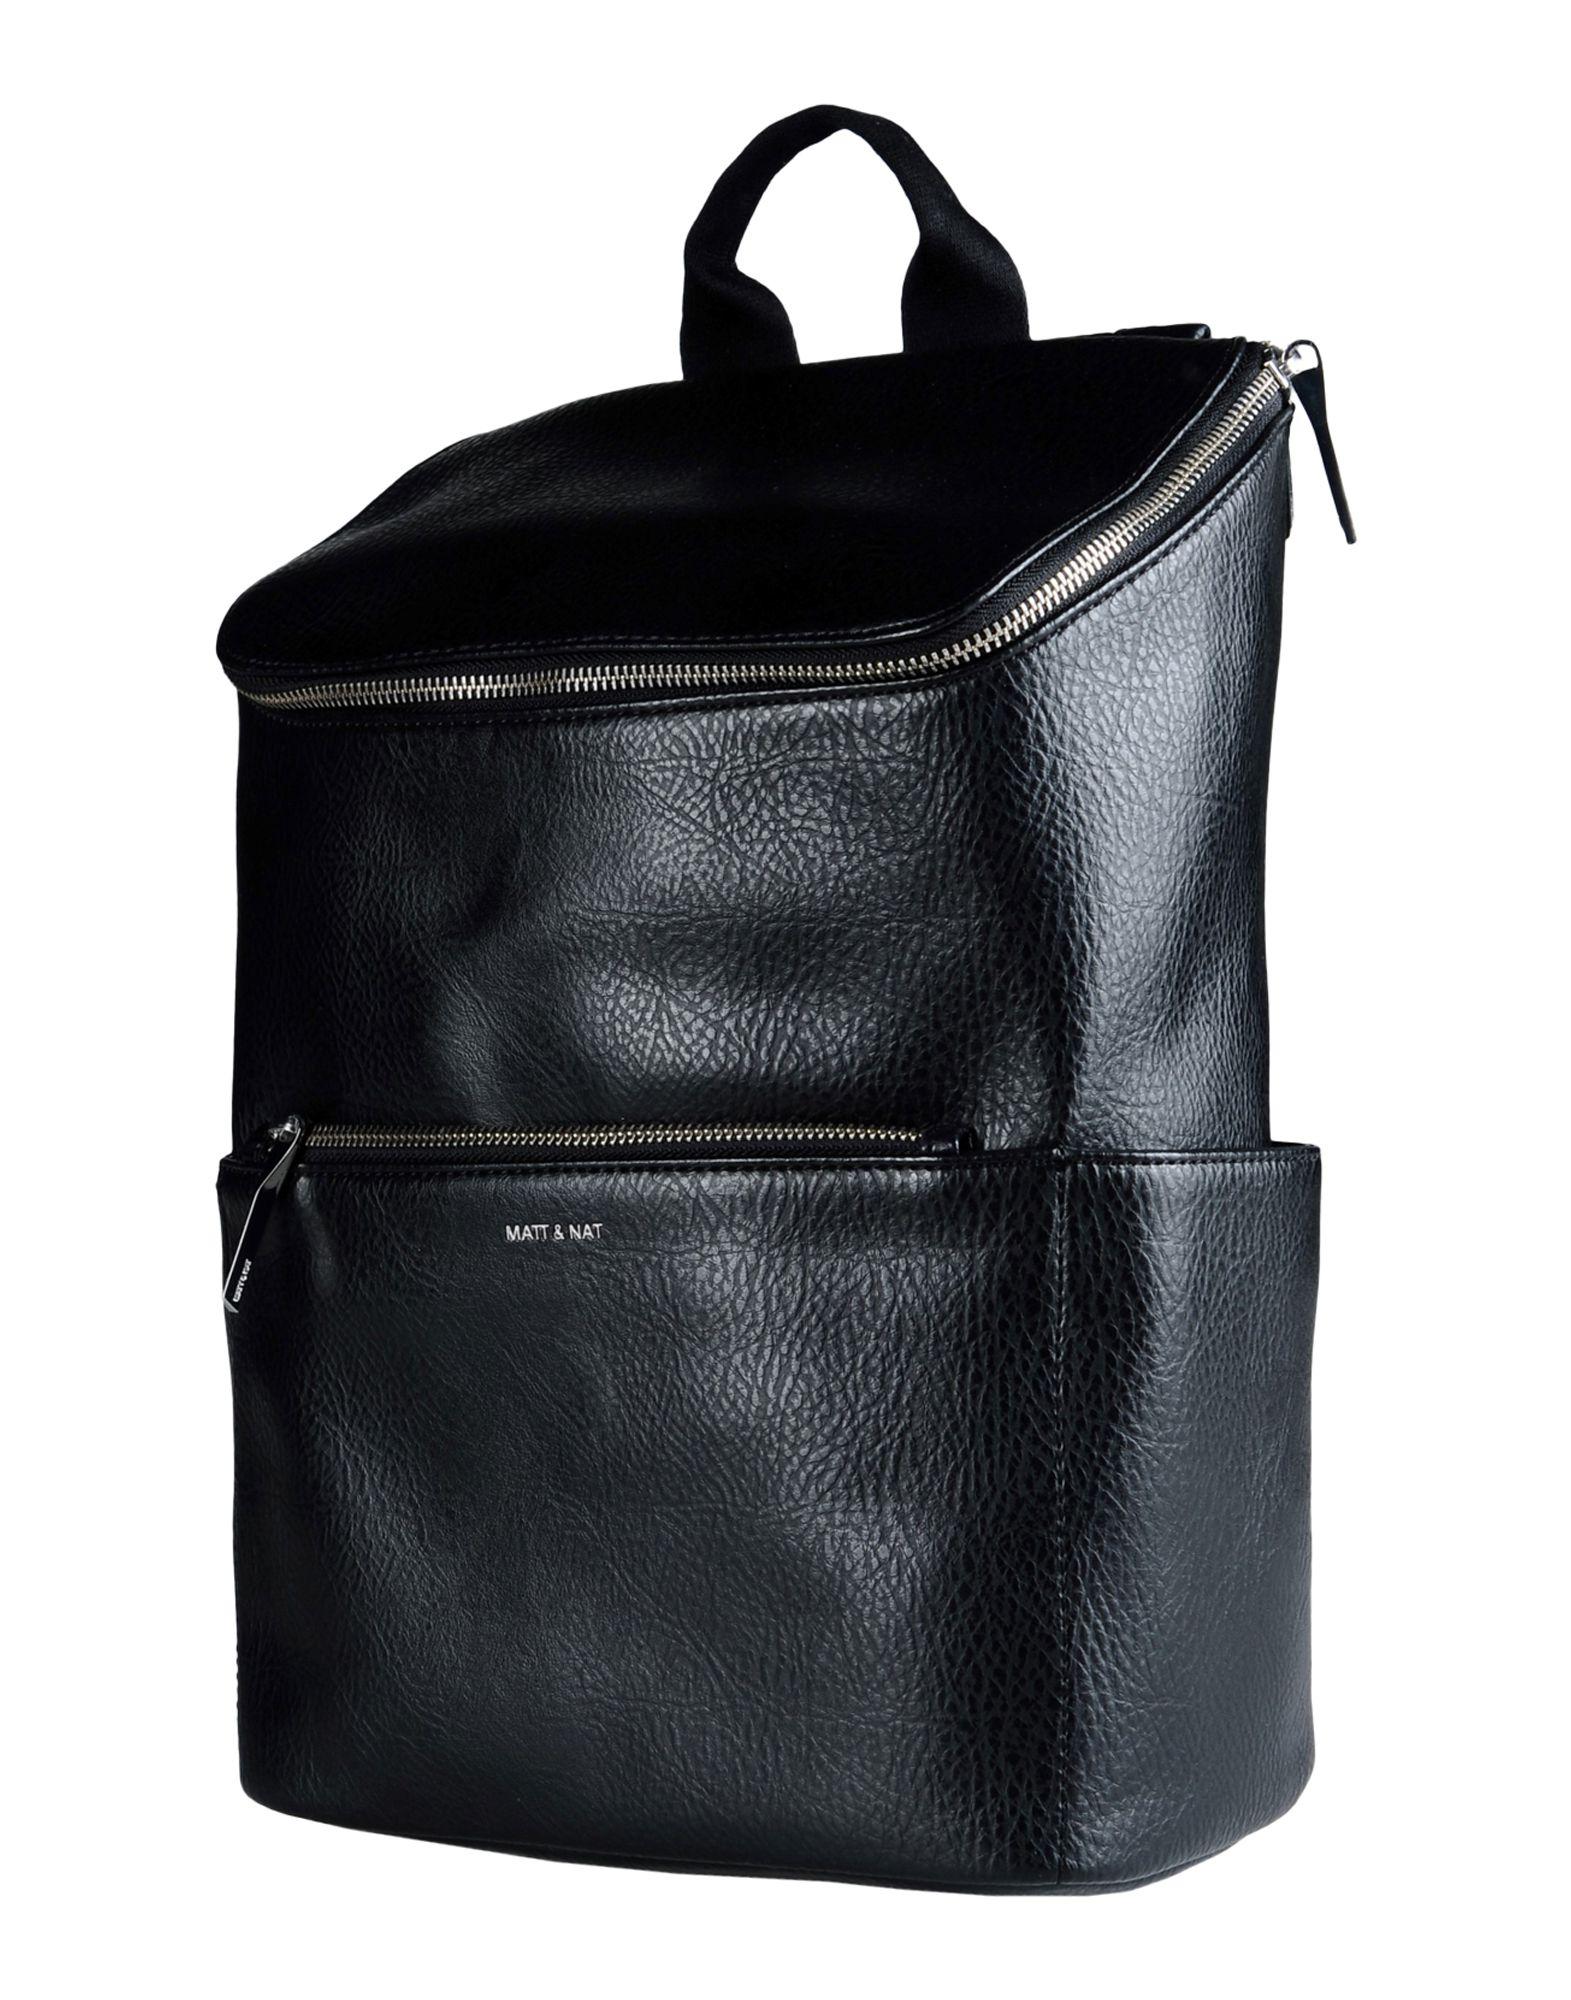 MATT & NAT Backpacks & Fanny packs